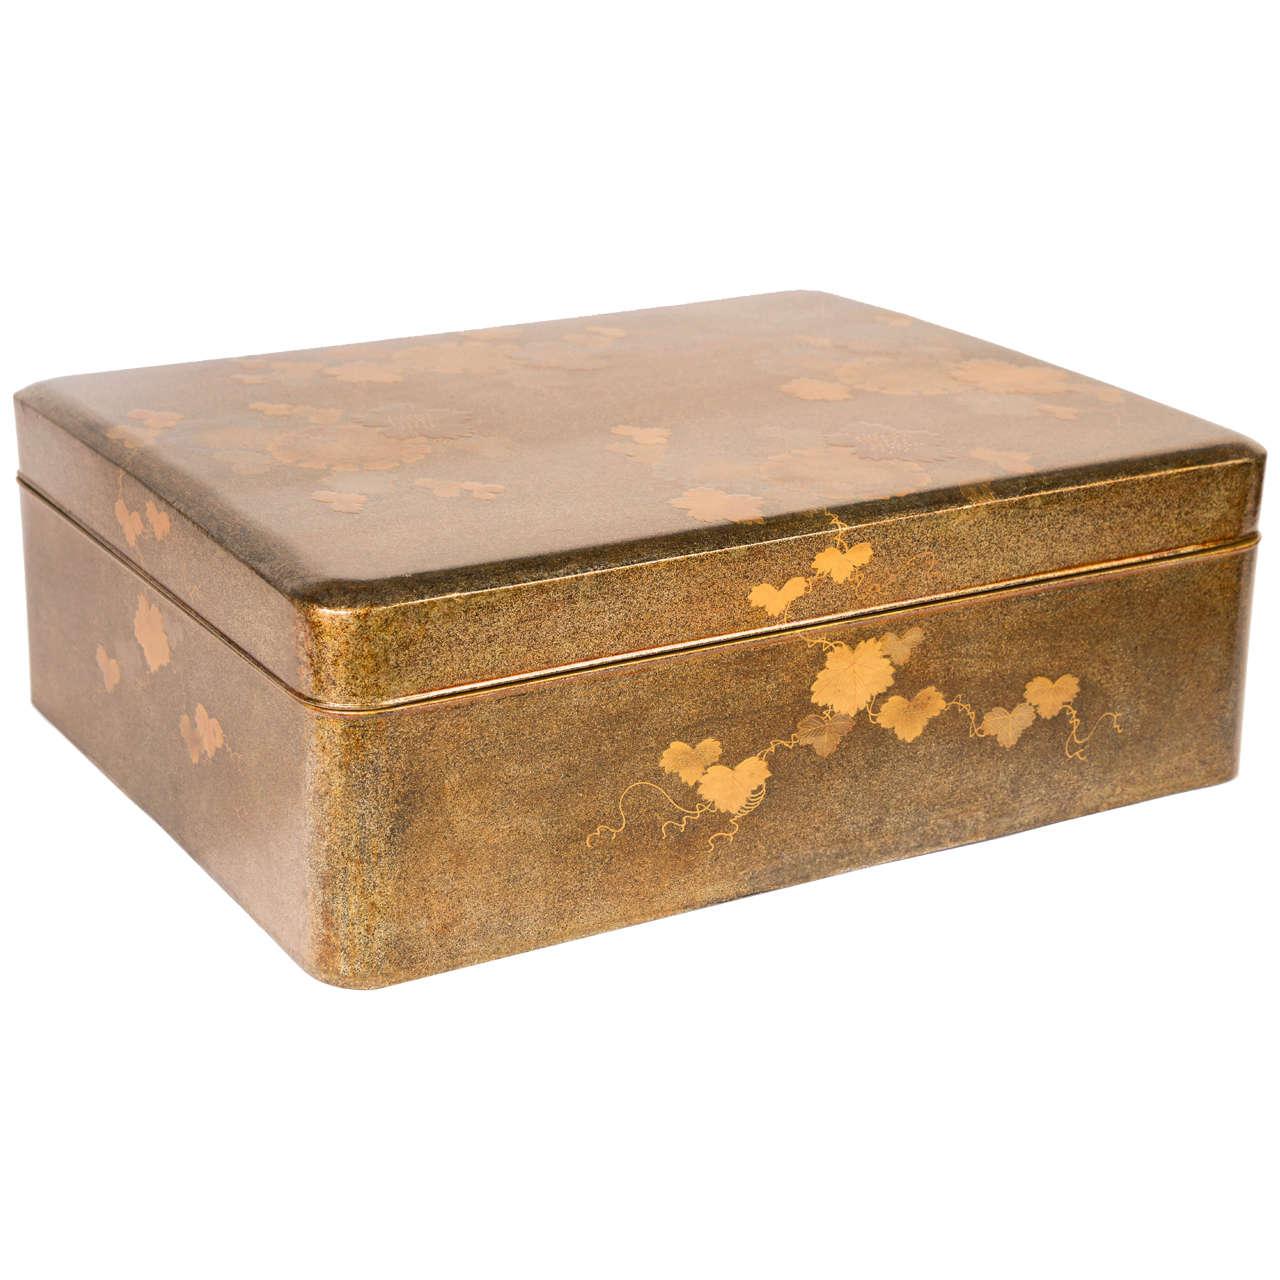 19th Century Japanese Lacquer Paper Storage Box Ryoshi Bako 1  sc 1 st  1stDibs & 19th Century Japanese Lacquer Paper Storage Box Ryoshi Bako at ... Aboutintivar.Com